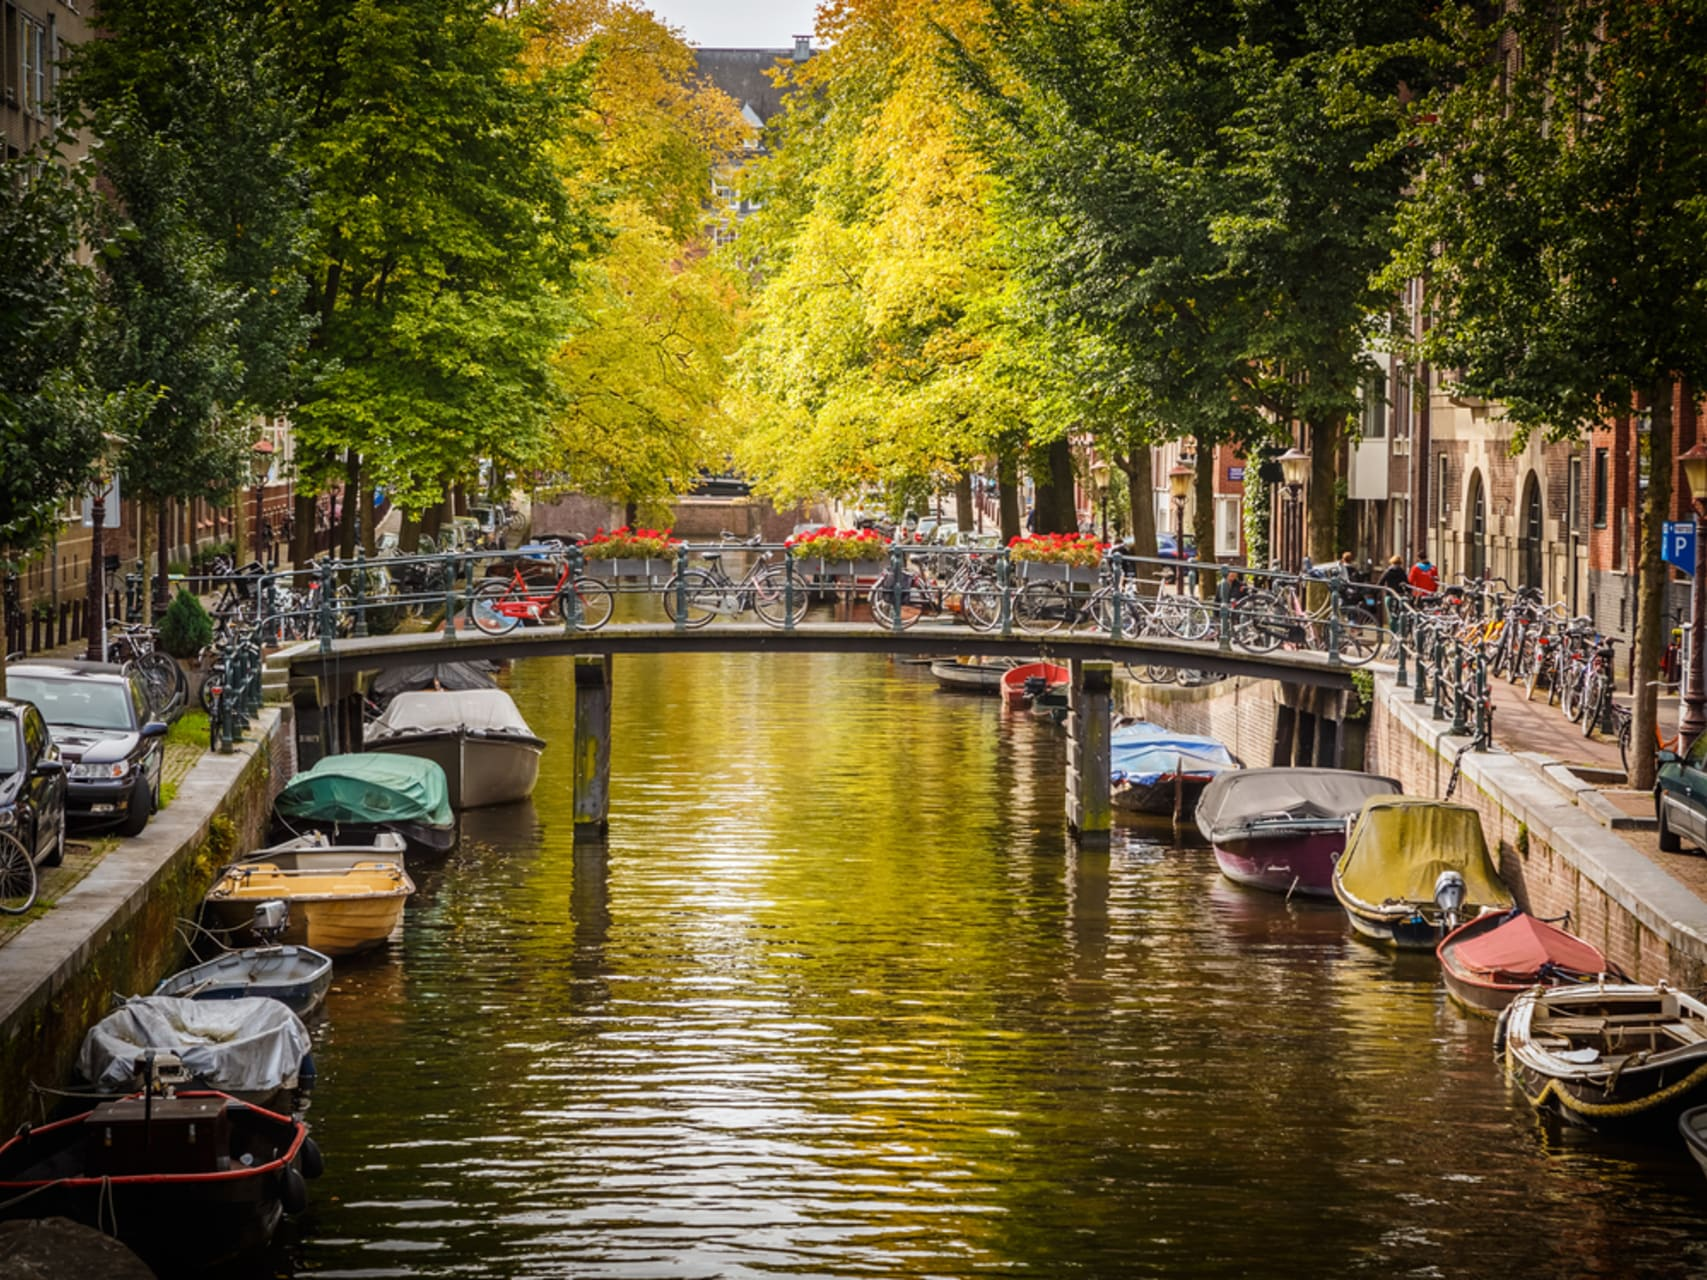 Amsterdam - 9 Streets, a Shopper's Paradise!